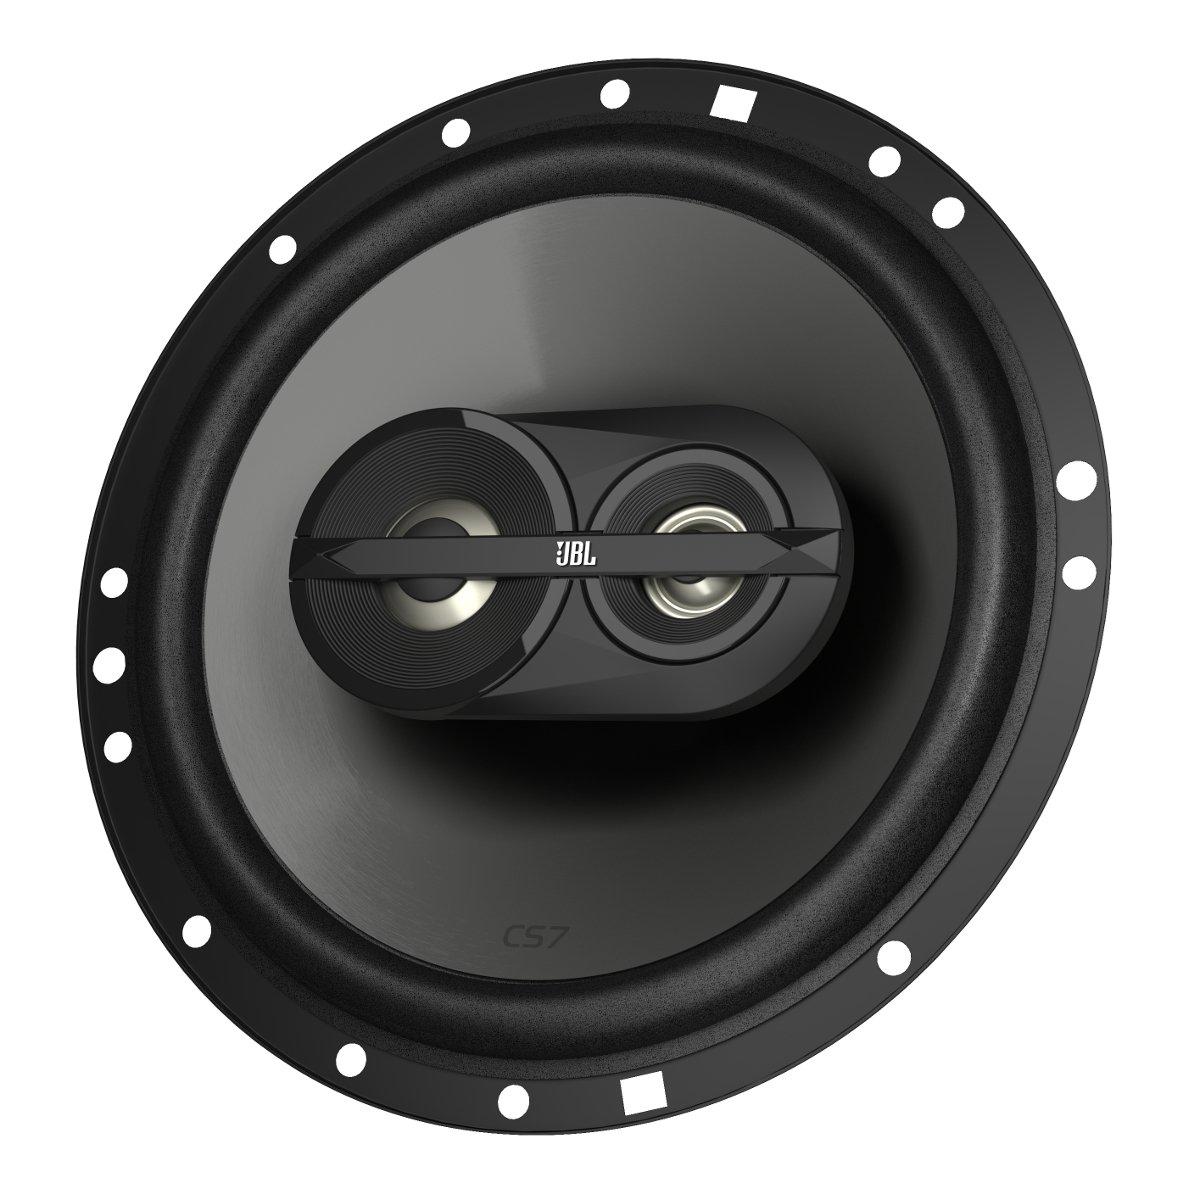 JBL CS763 CS-Series 6.5in 135 Watts Peak 3-Way Coaxial Car Audio Loudspeaker